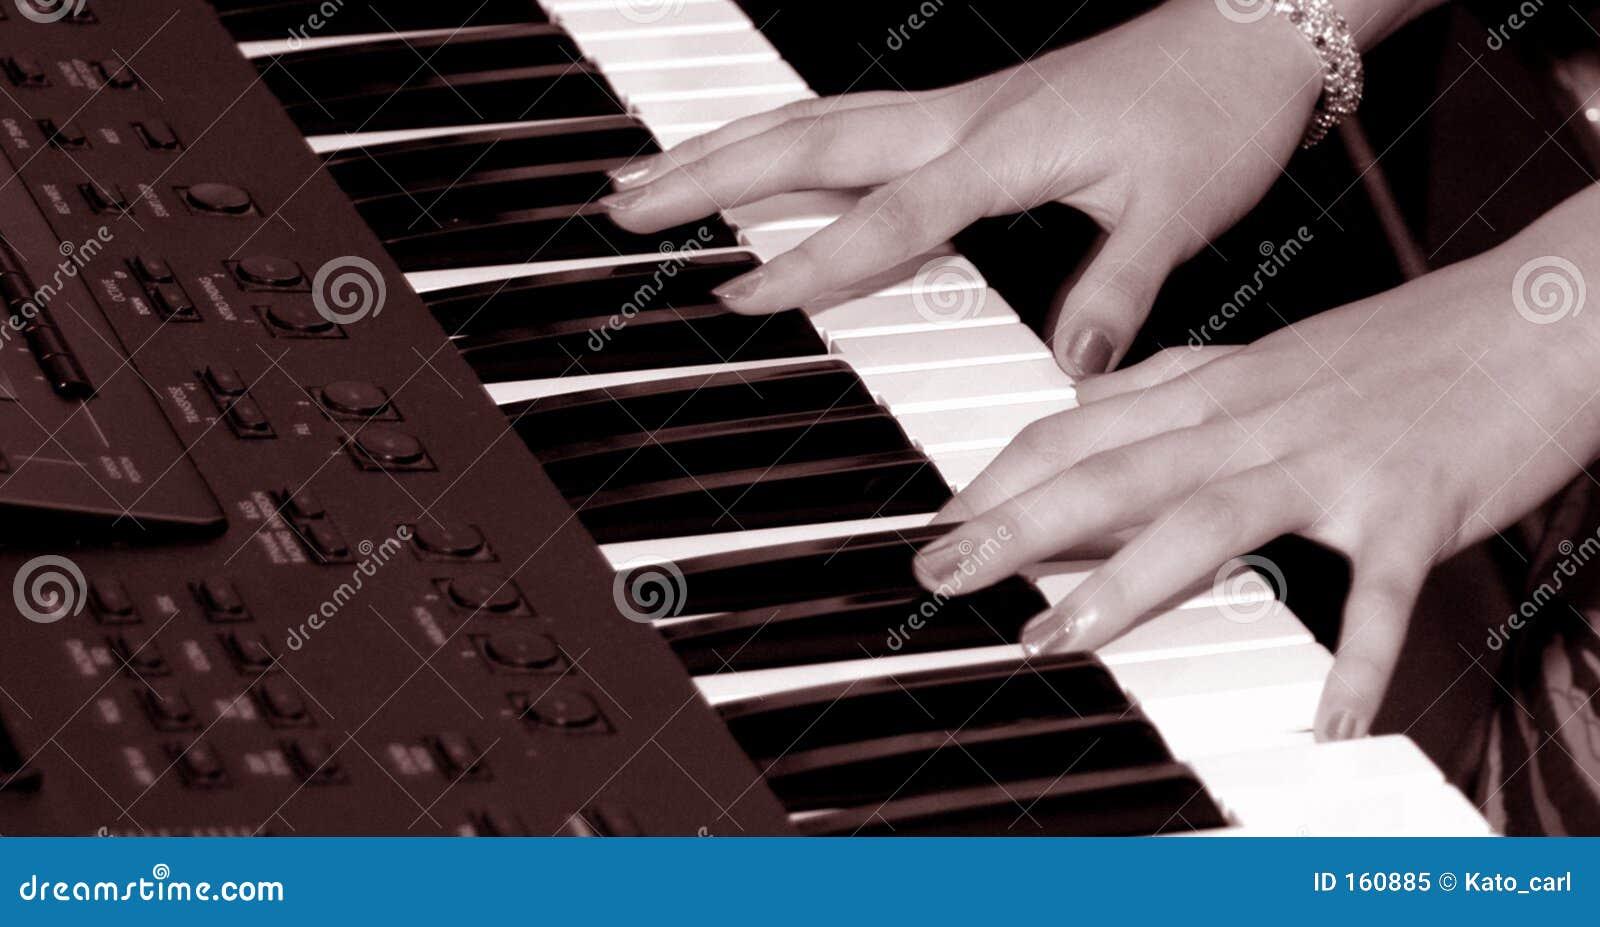 Playing Keybroad